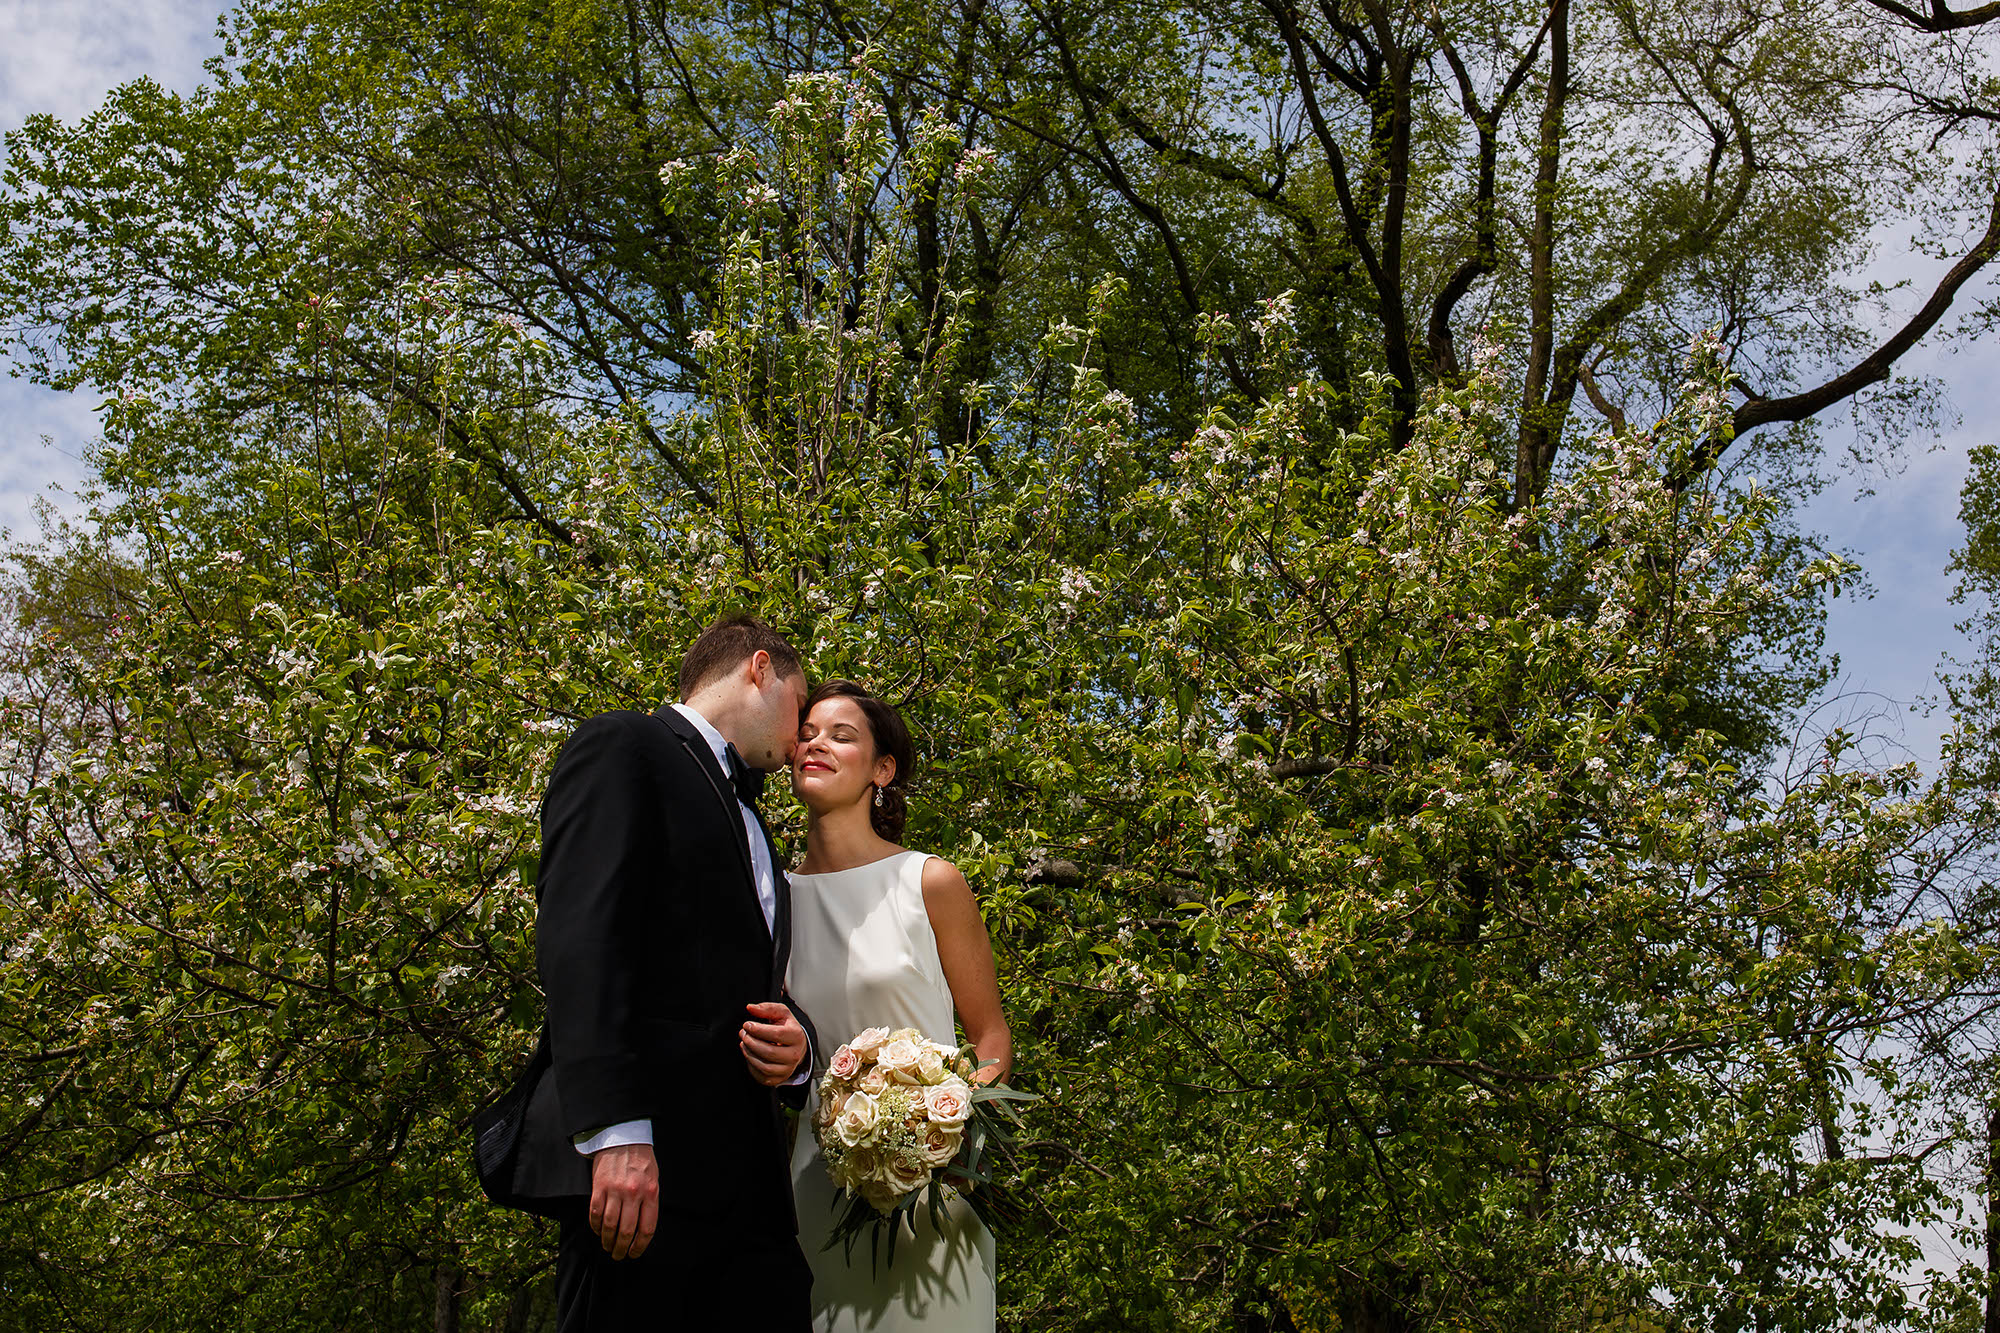 Canton, Copyright Genevieve Nisly Photography, Gervasi Vineyard, Ohio, Spring, Wedding, Category|Wedding, Seasons|Spring, Venues|Ohio, Venues|Ohio|Canton, Venues|Ohio|Canton|Gervasi Vineyard, Gervasi